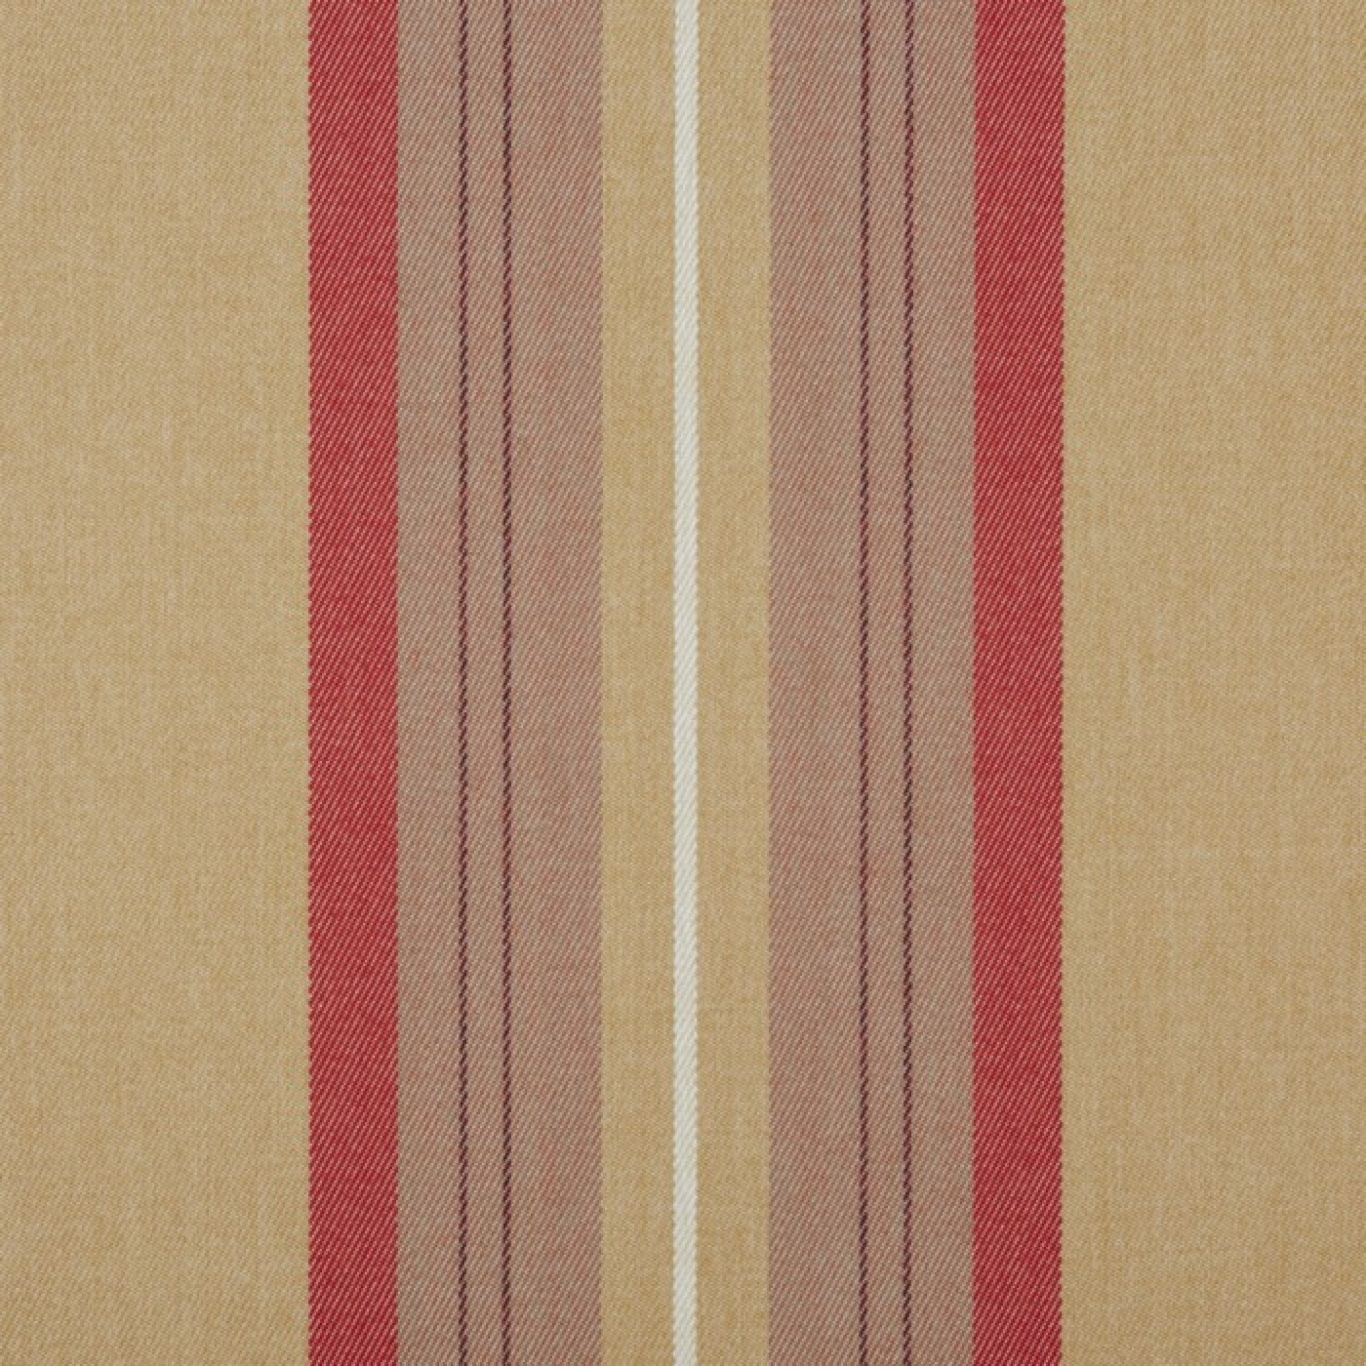 Image of Prestigious Glenfinnan Cardinal Fabric